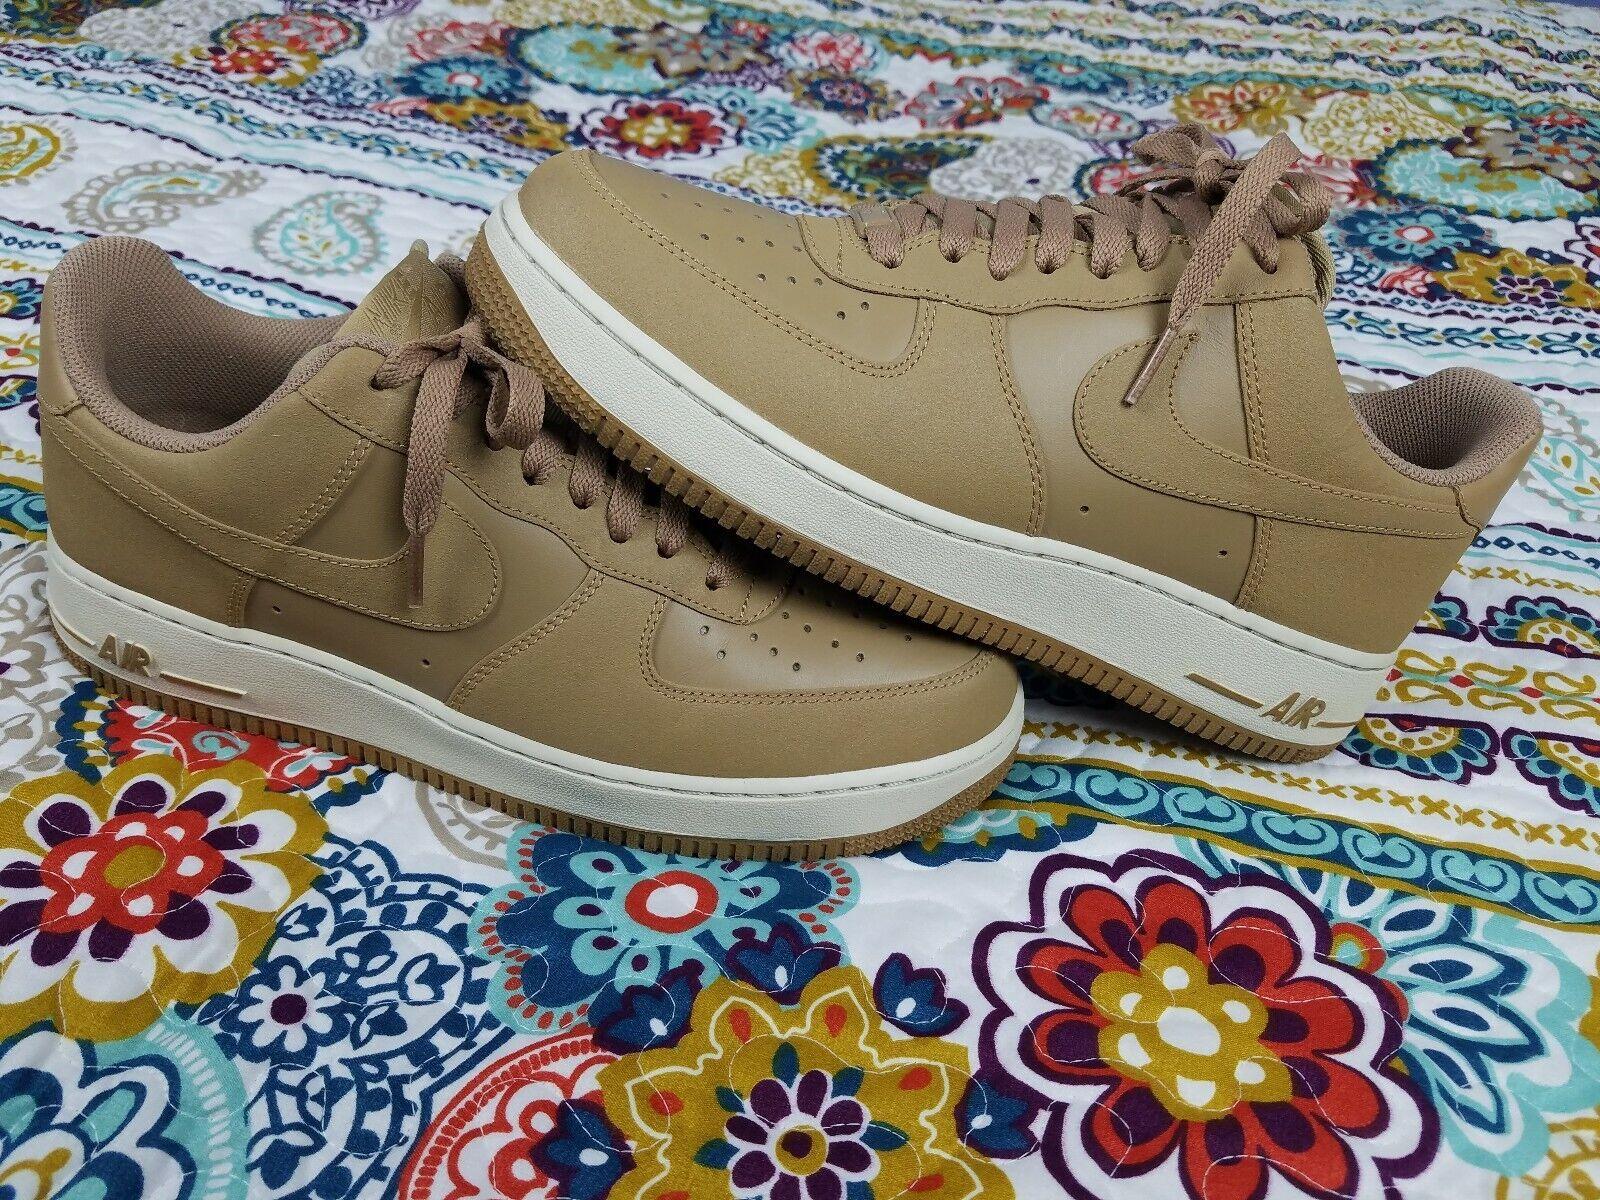 Nike Air Force 1 One Low 07 Beechtree Beechtree Beechtree Tan Mens Sz 10 Basketball shoes 2011 bone 1eb0d4